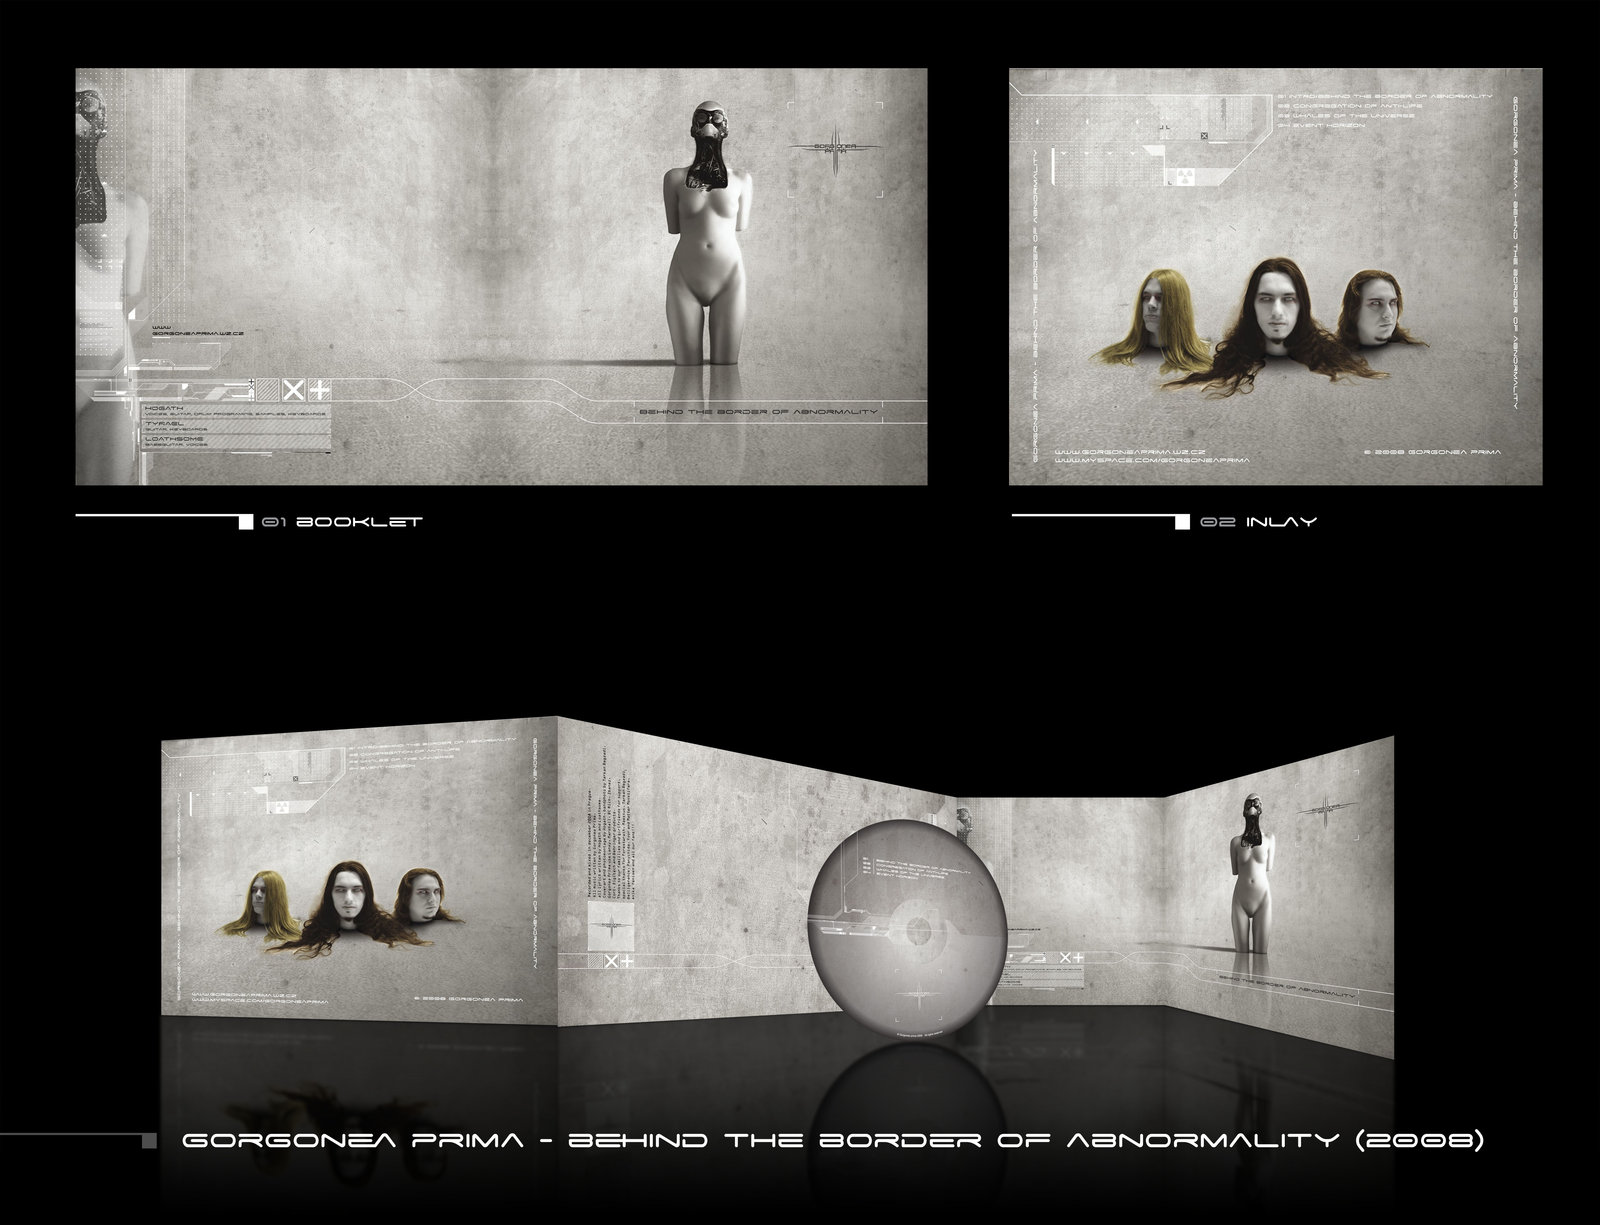 gorgonea_prima_cd_cover_by_shuwit